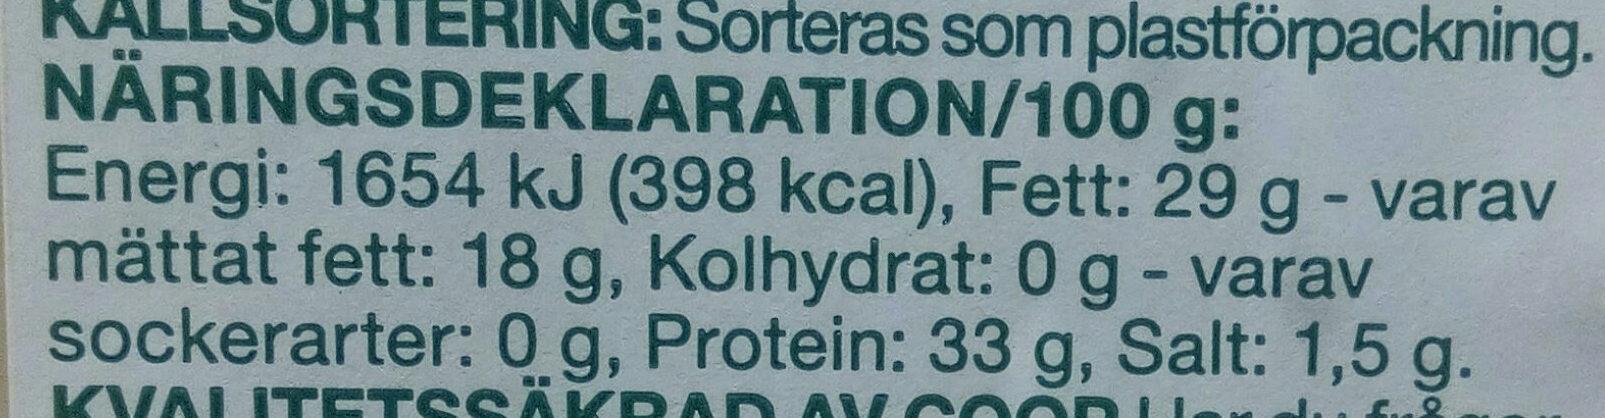 Grana Padano 6 mesi - Informations nutritionnelles - sv